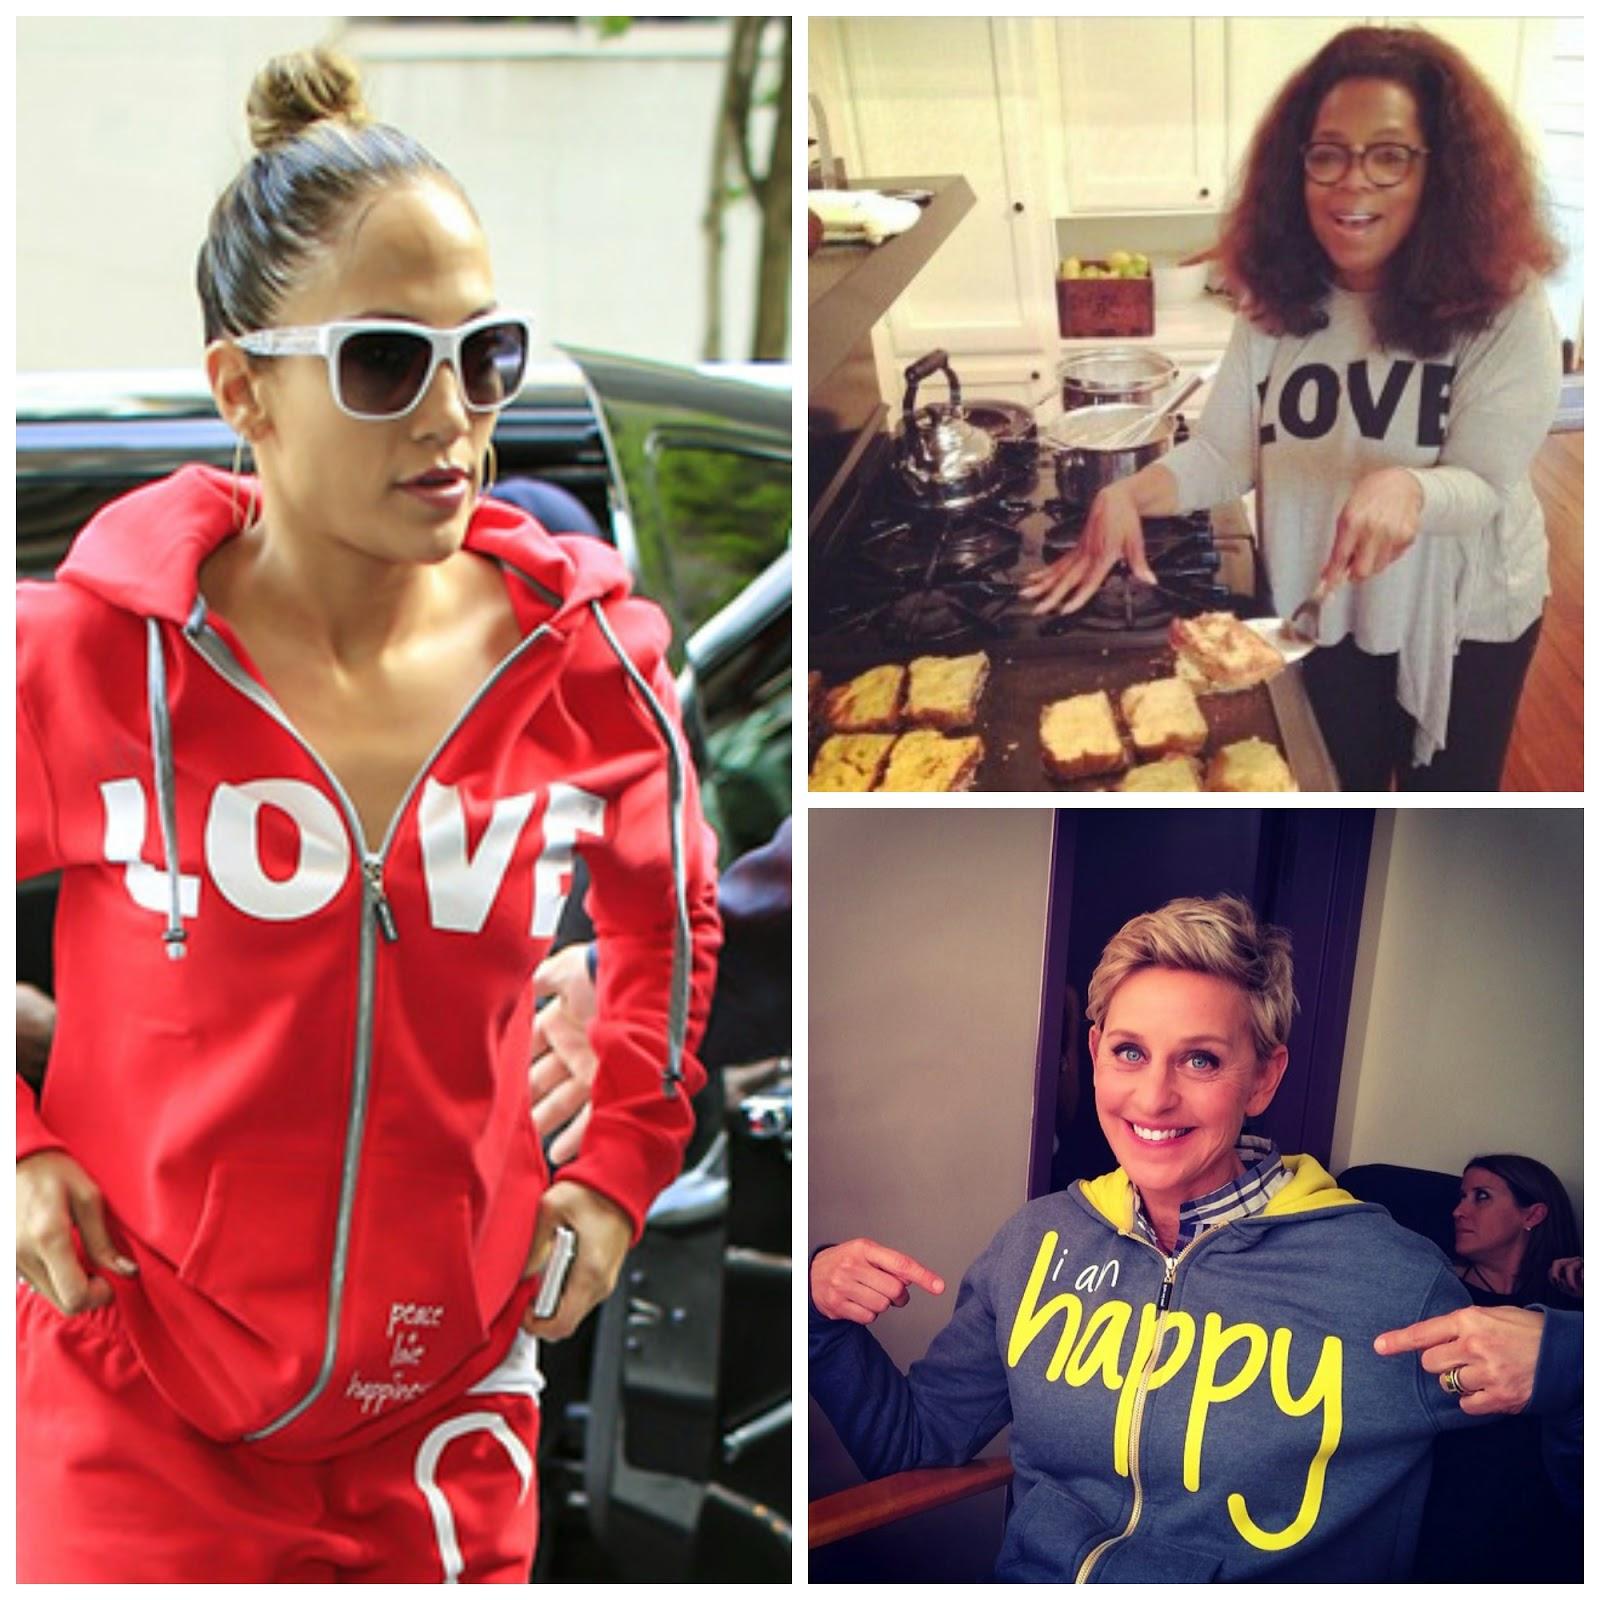 A List Celebrities Love The Casual Wear Clothing Including Jennifer Lopez Oprah And Ellen Degeneres